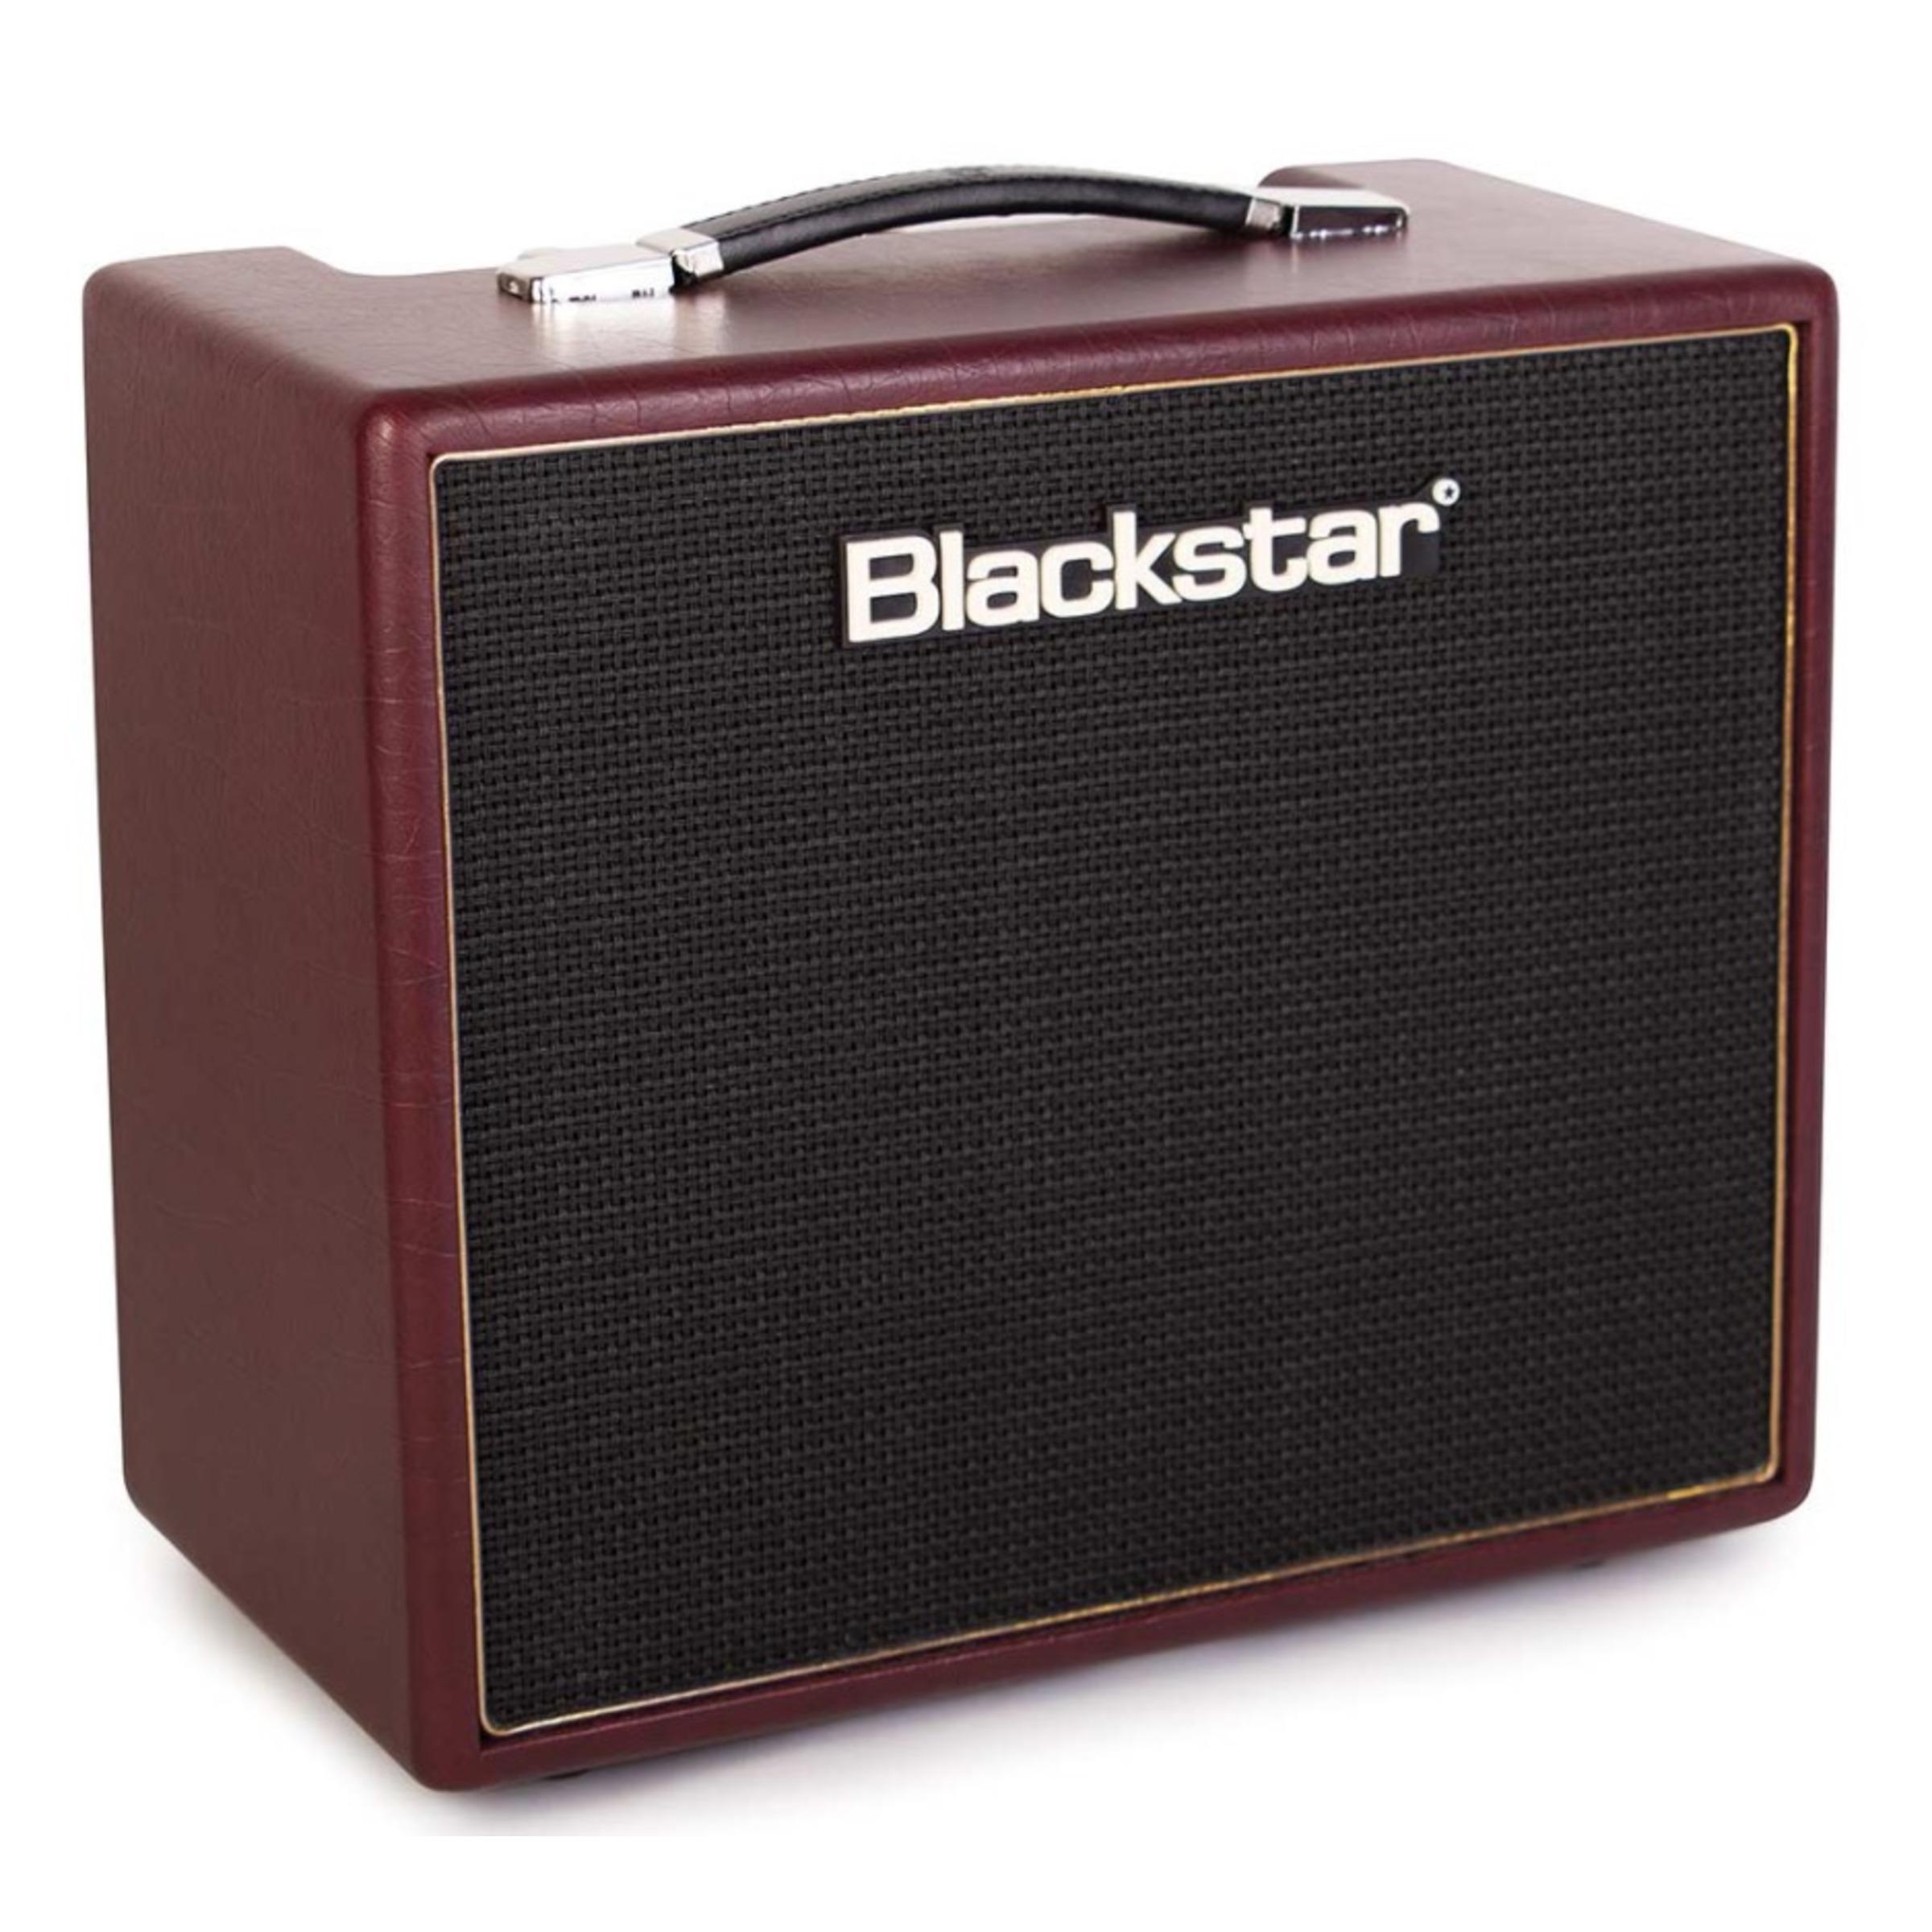 blackstar artisan 10 ae 10th anniversary guitar combo giggear. Black Bedroom Furniture Sets. Home Design Ideas